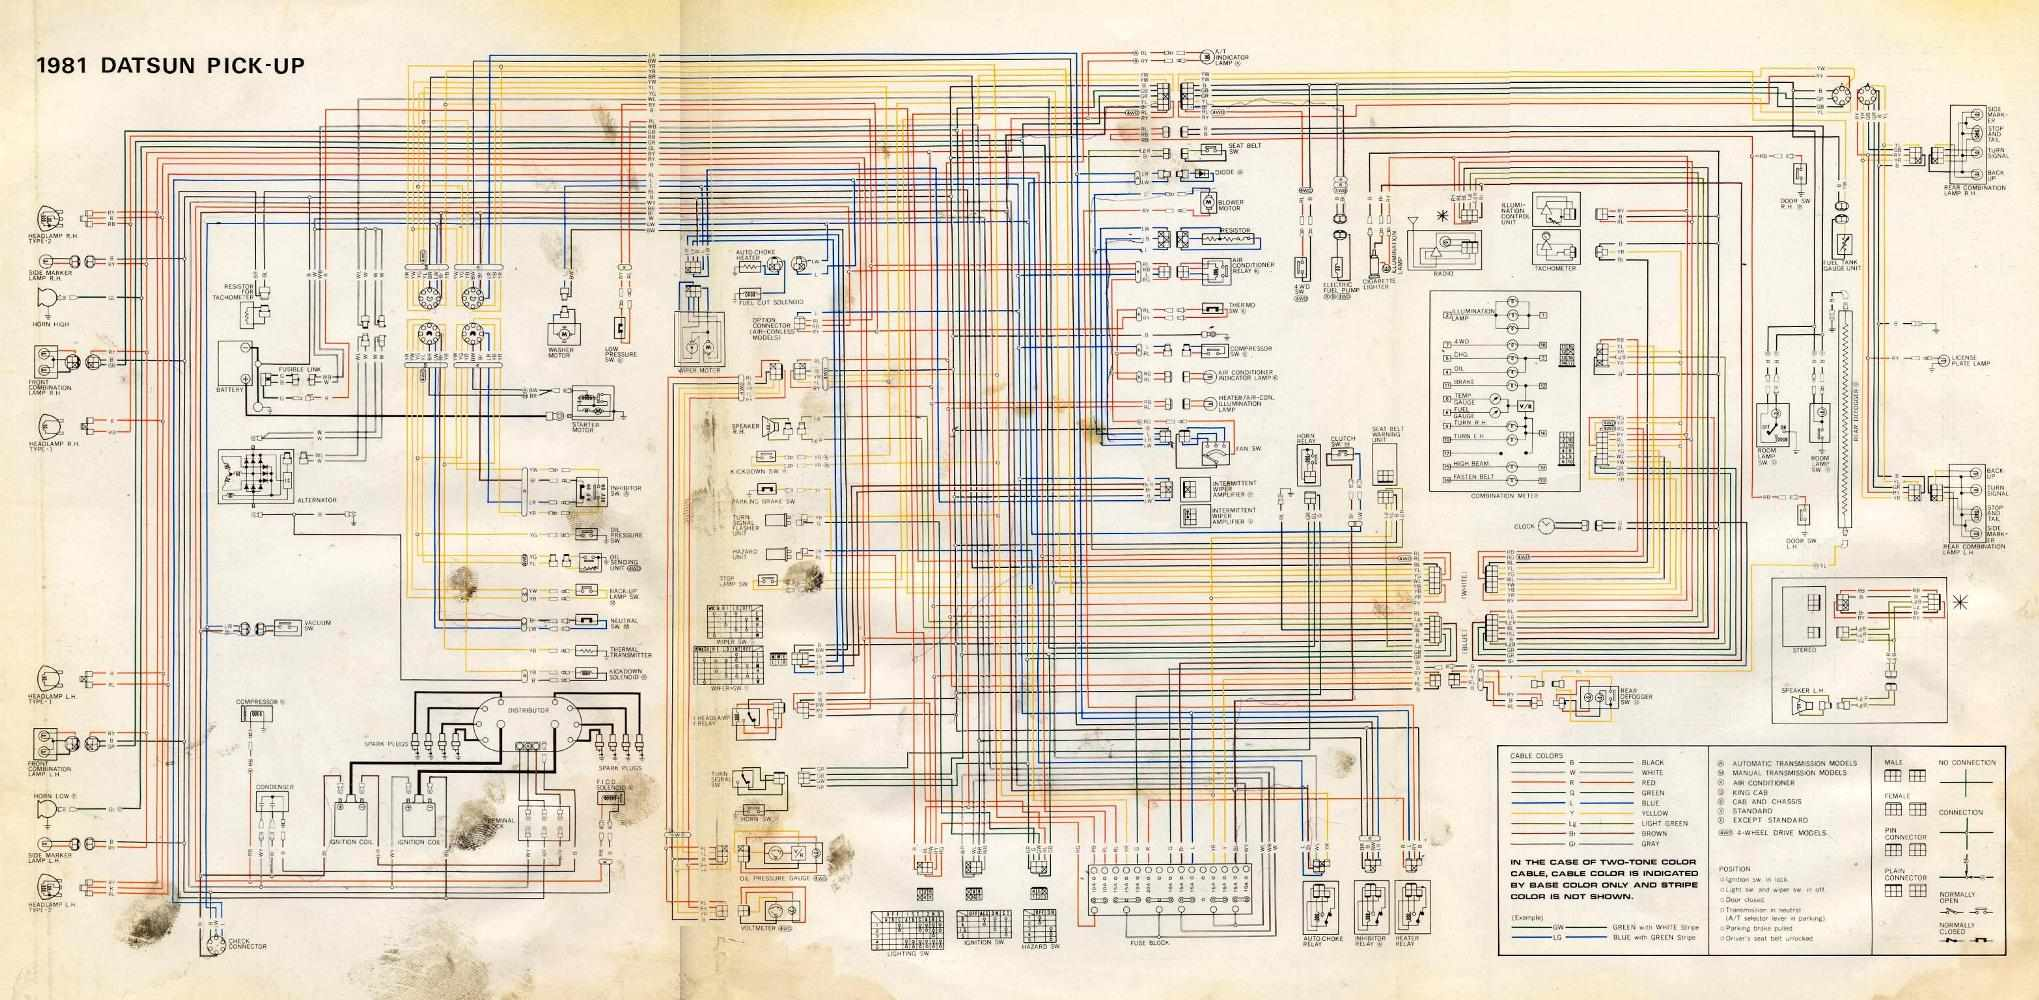 81 Dodge Challenger Wiring Schematic Electrical Diagrams Diagram 1973 Fuse Panel 2005 Caravan Box Wire Plum Crazy